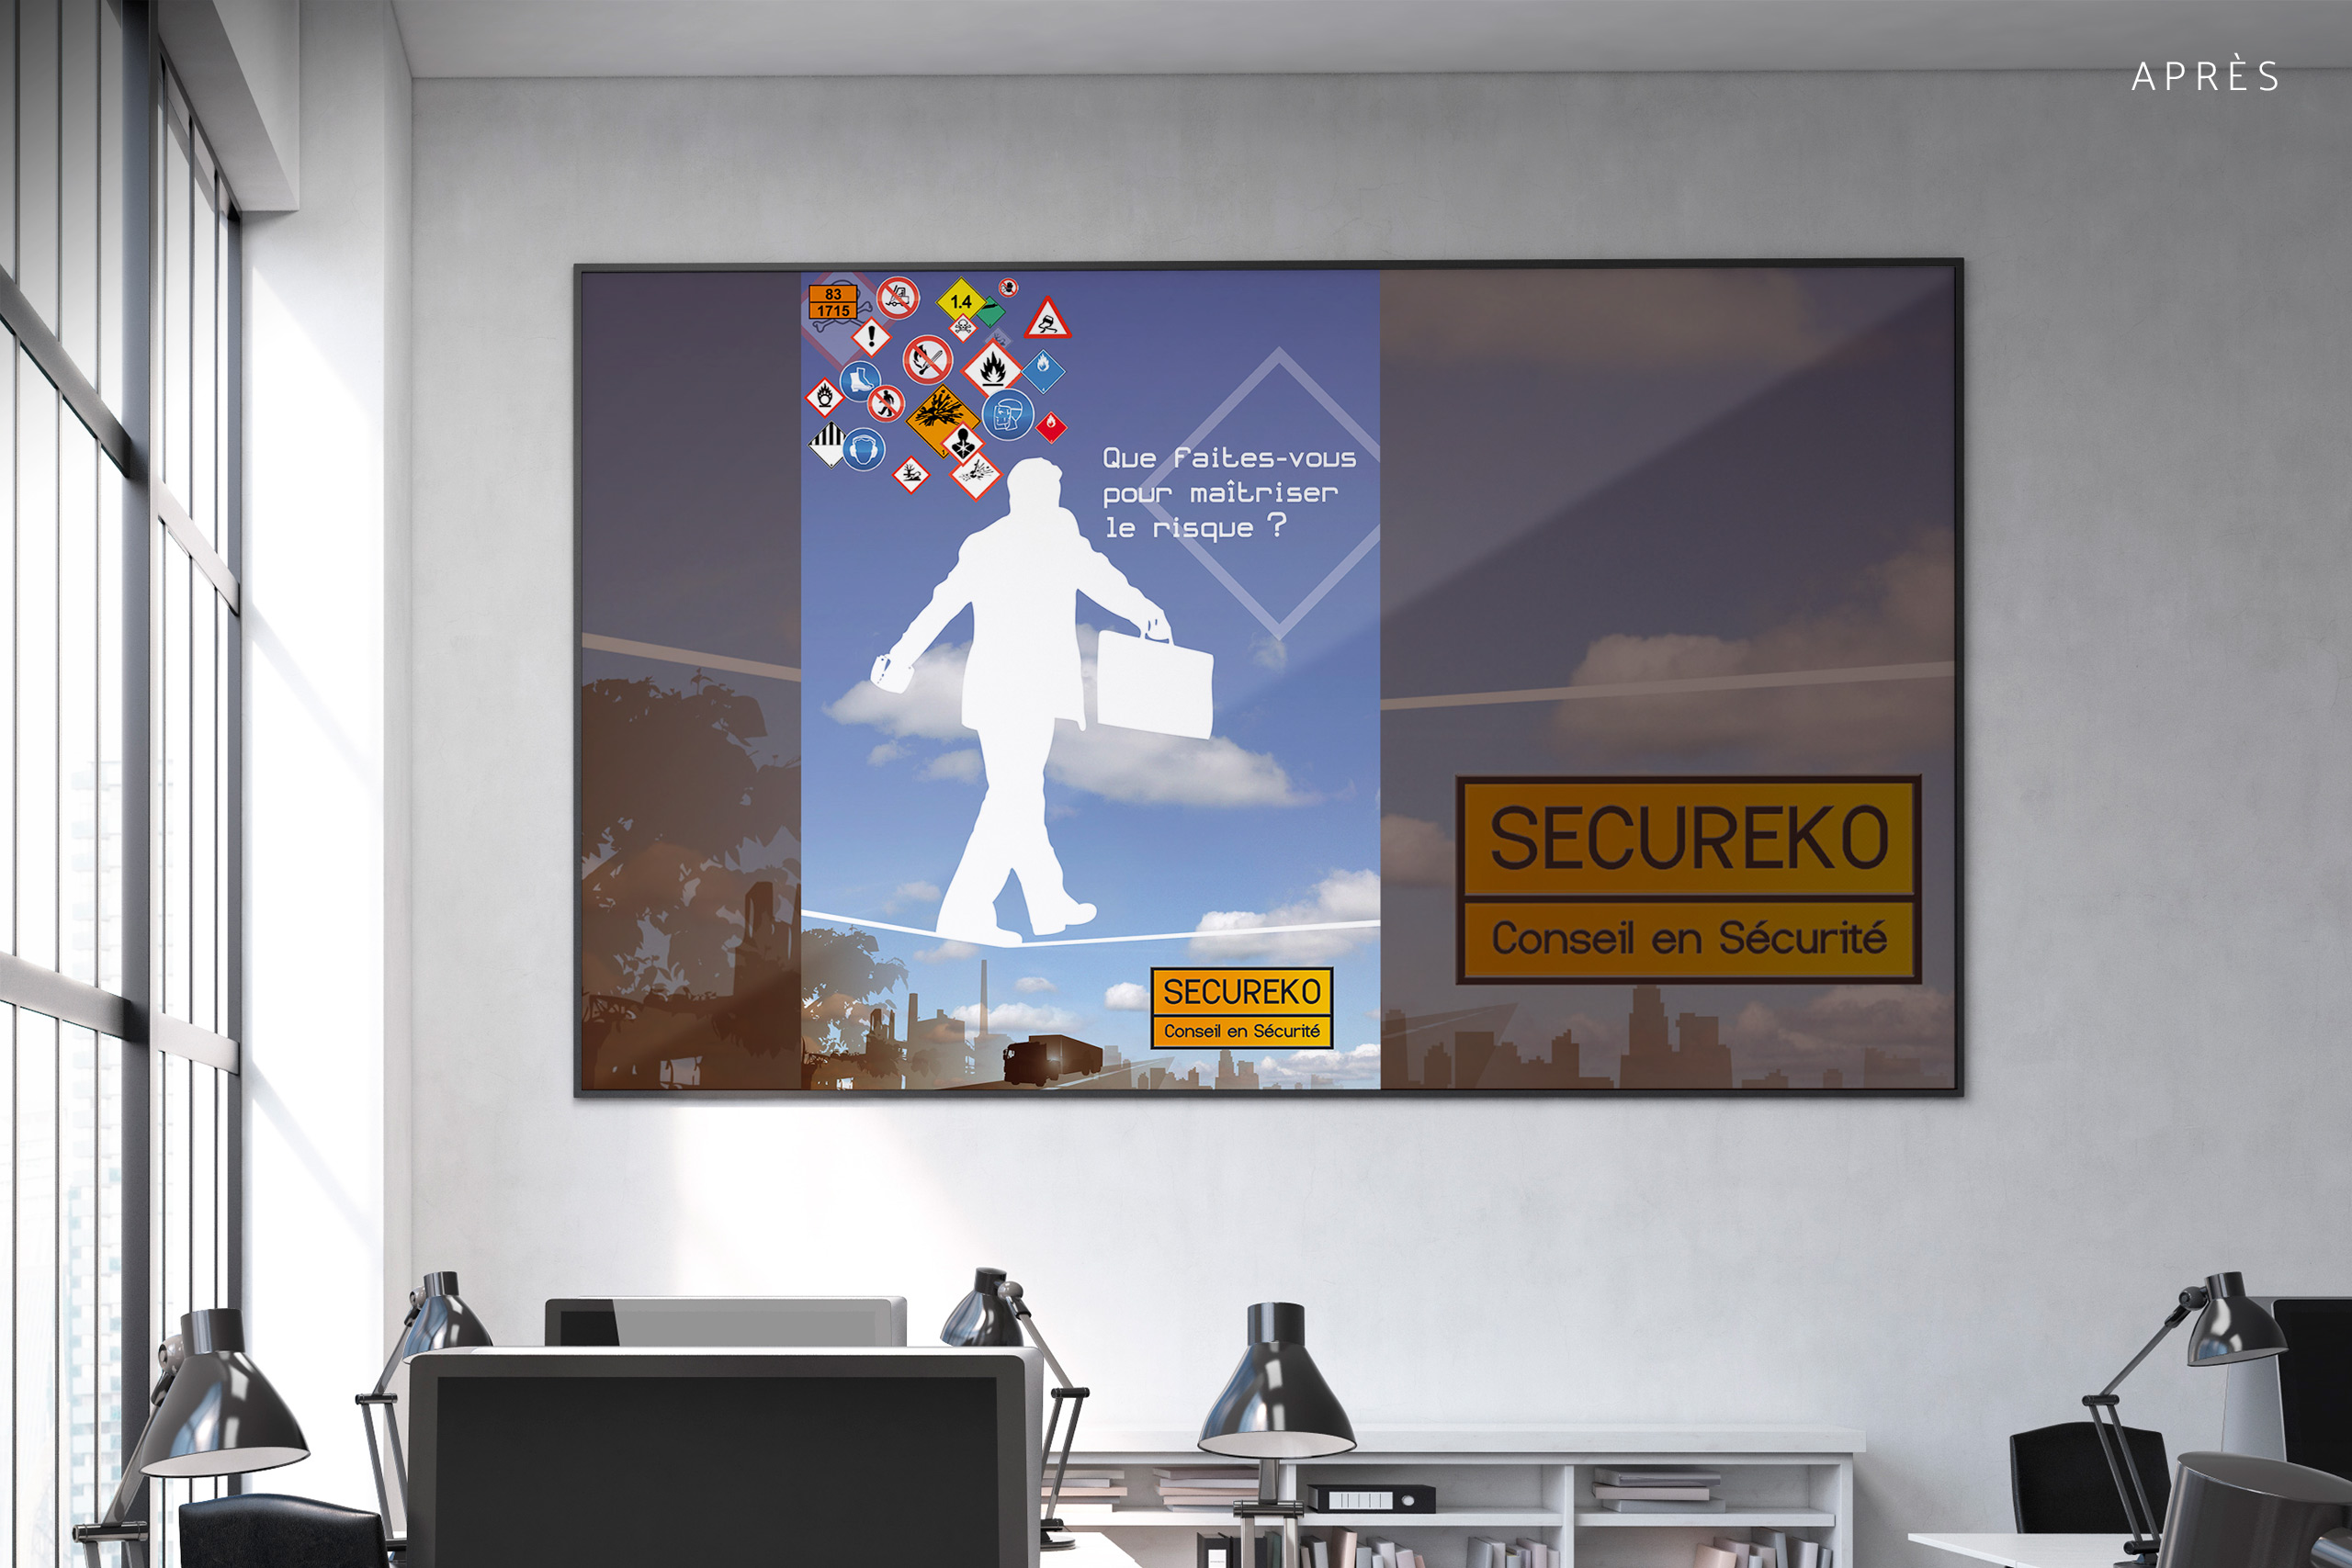 Secureko-apres-Agence-communication-Love-My-Name